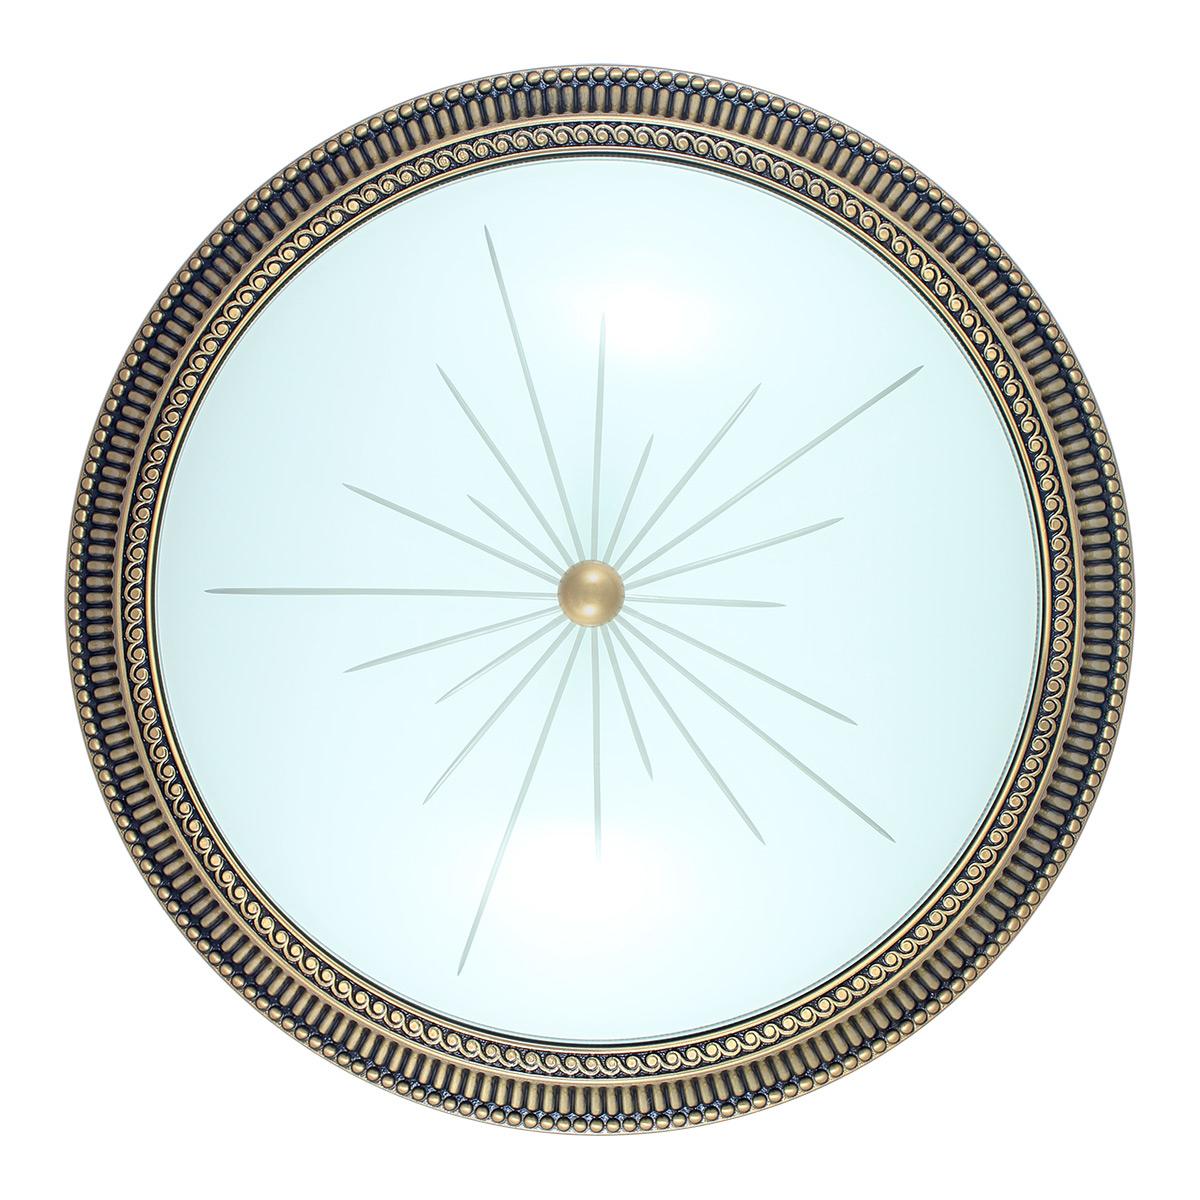 Изображение Plafoniera in bronzo - Stile rigato - Diametro 50,6 cm